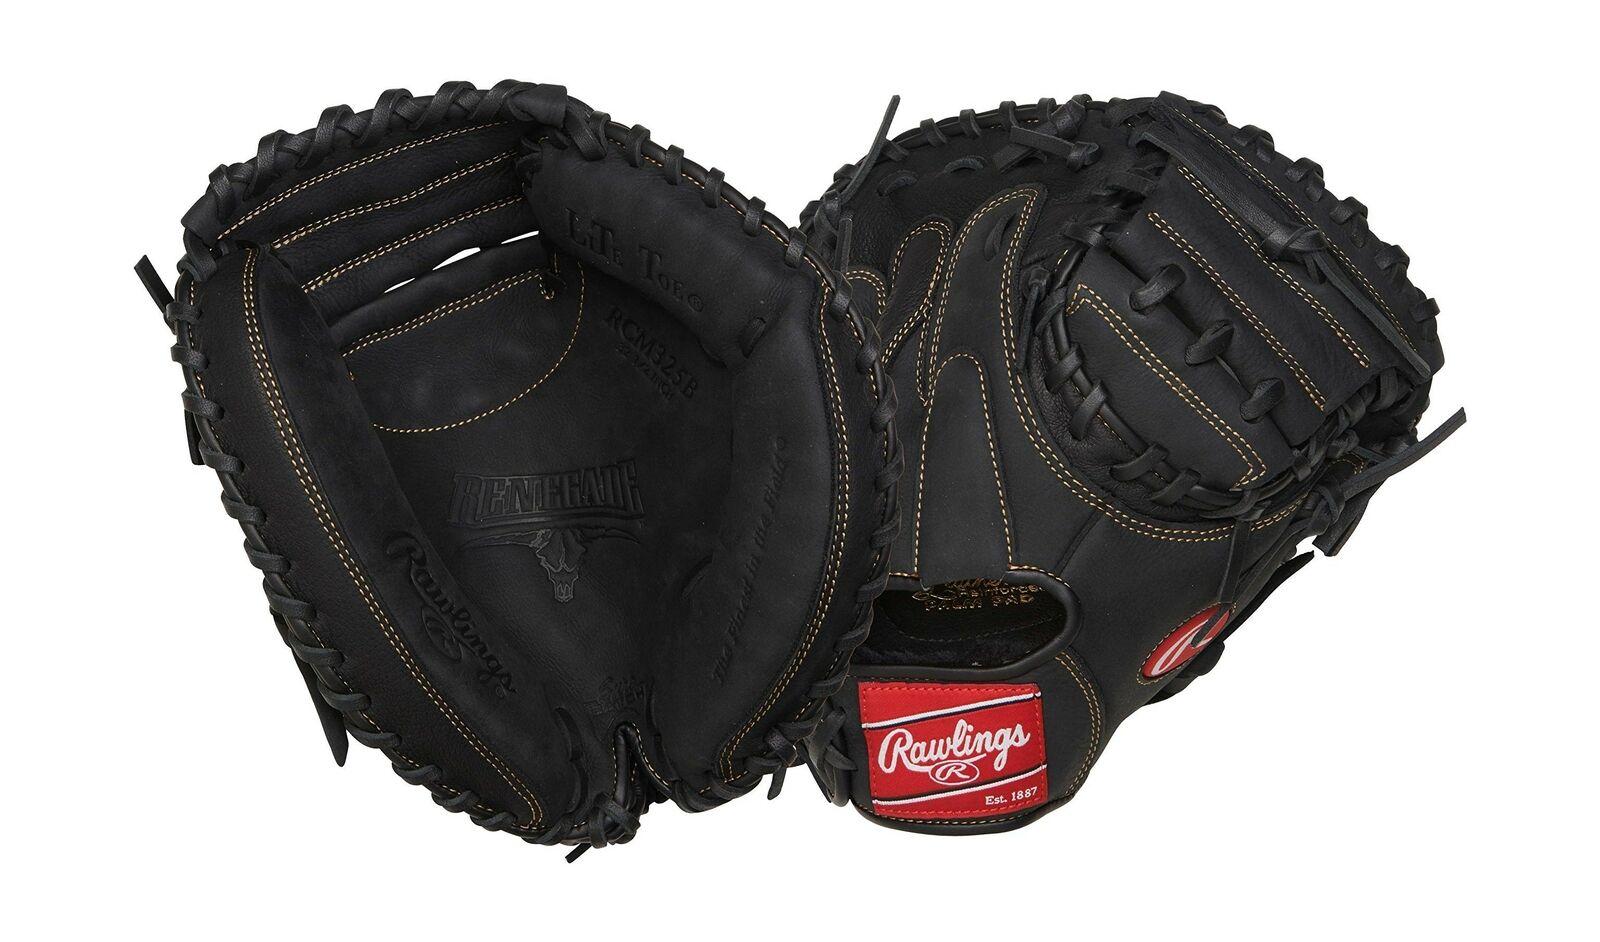 Rawlings Serie renegada de Béisbol Softbol Guantes Left Hand Throw Catcher